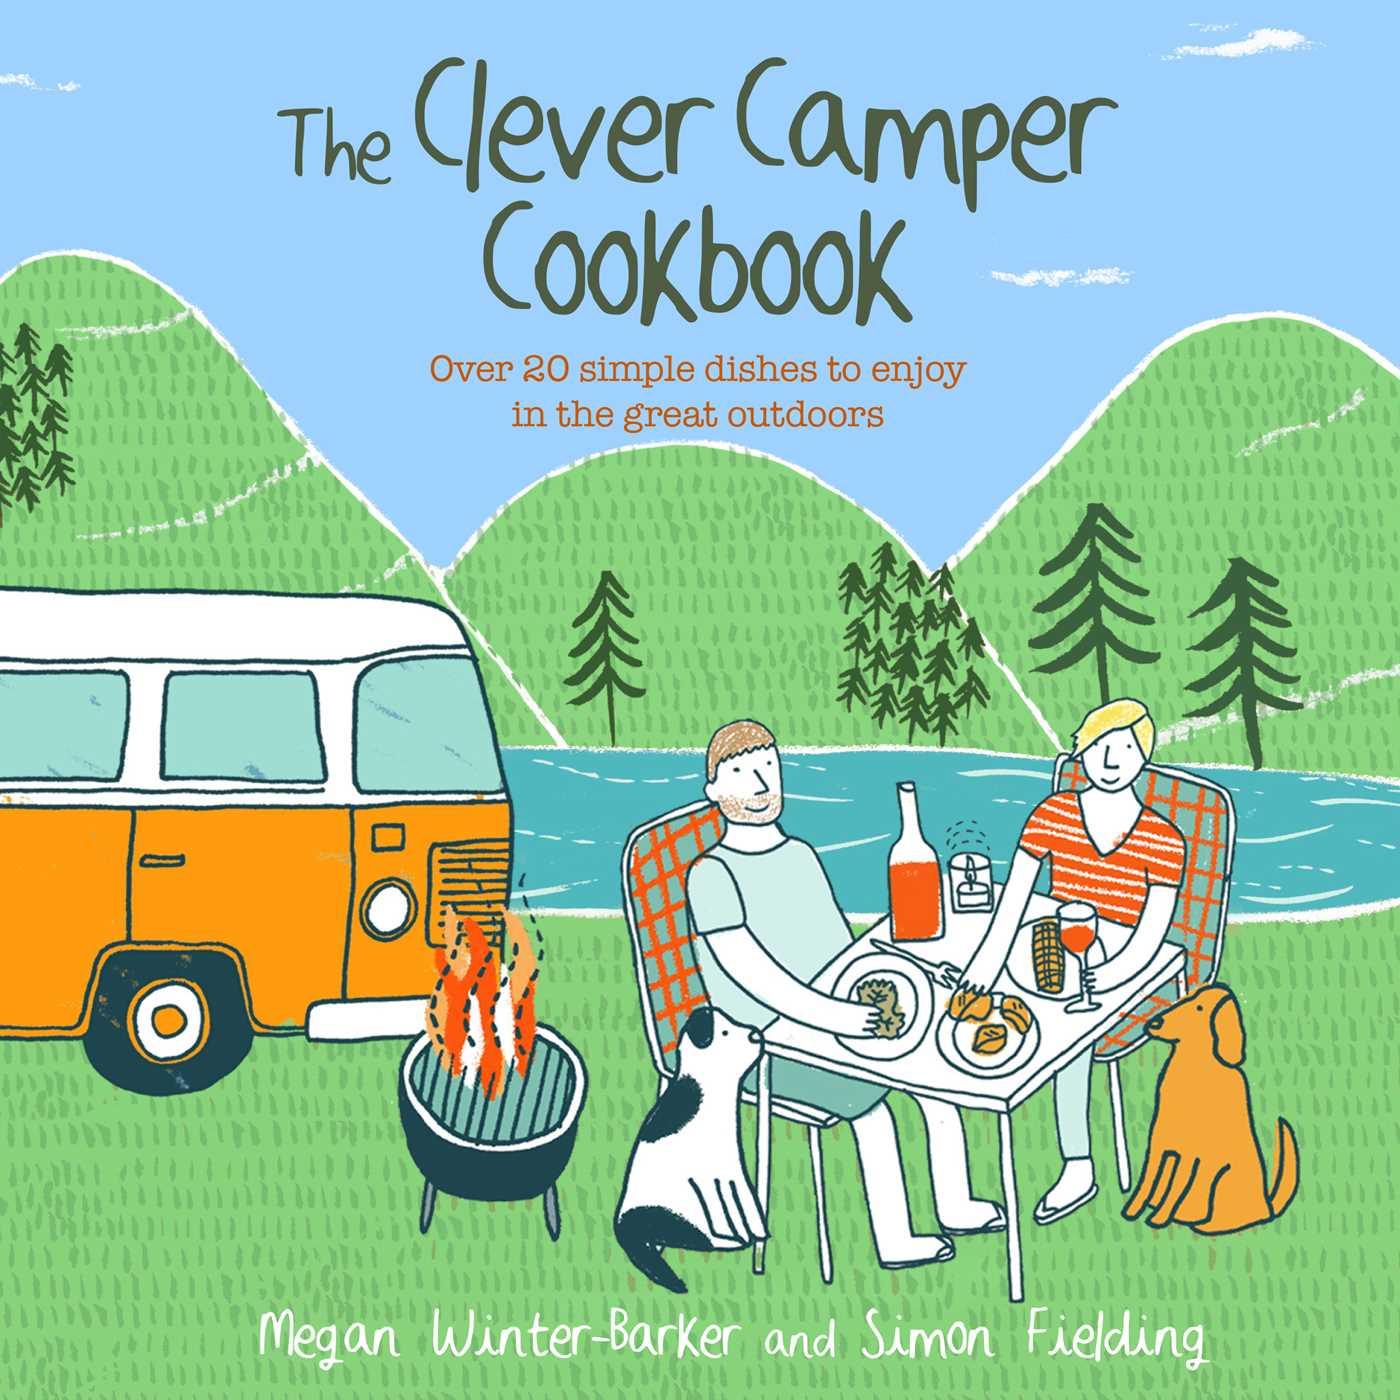 The clever camper cookbook 9781911026419 hr